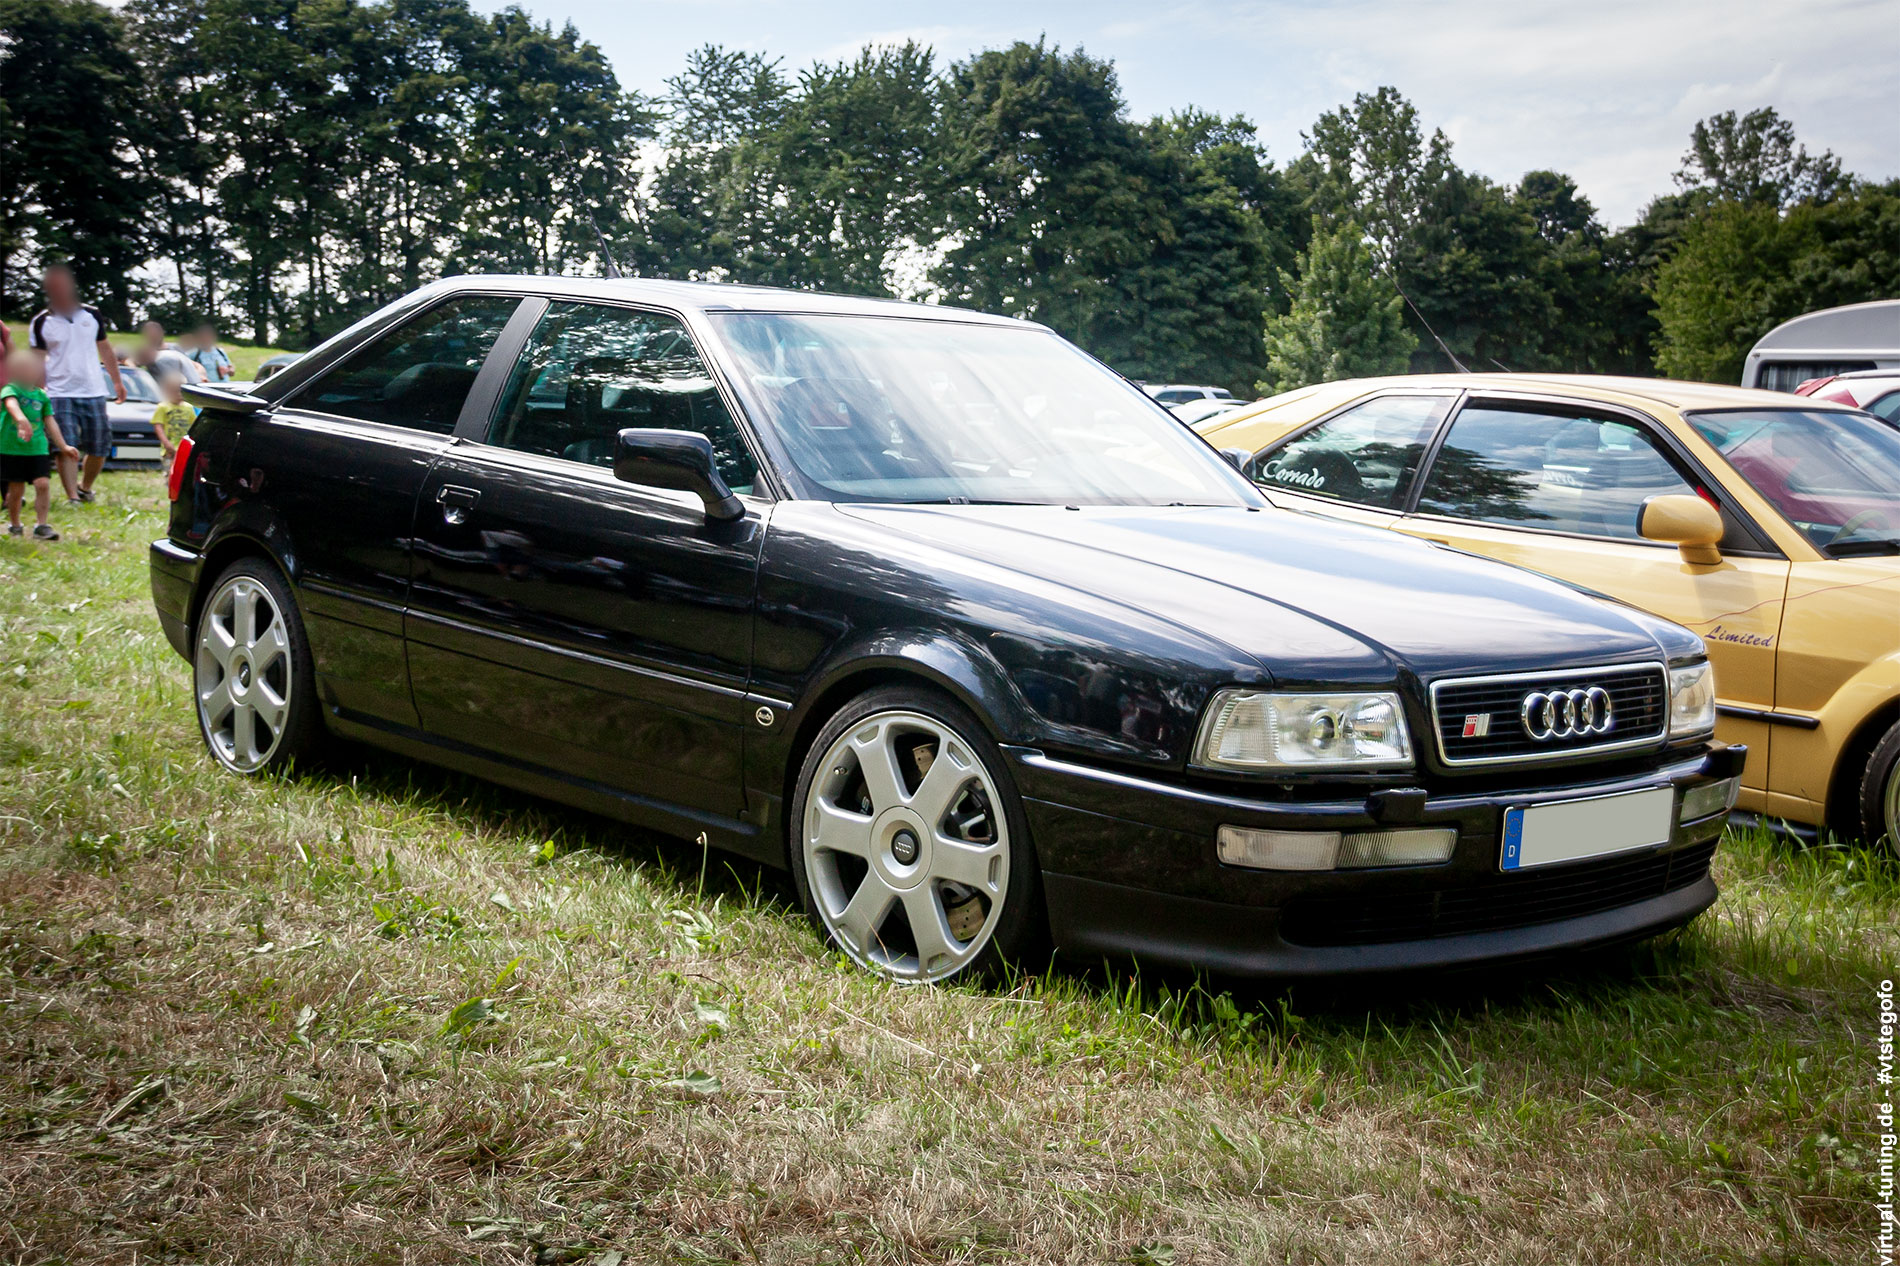 Audi S2 Coupe - 4. Sadisdorfer ü30 Treffen (07.2021)